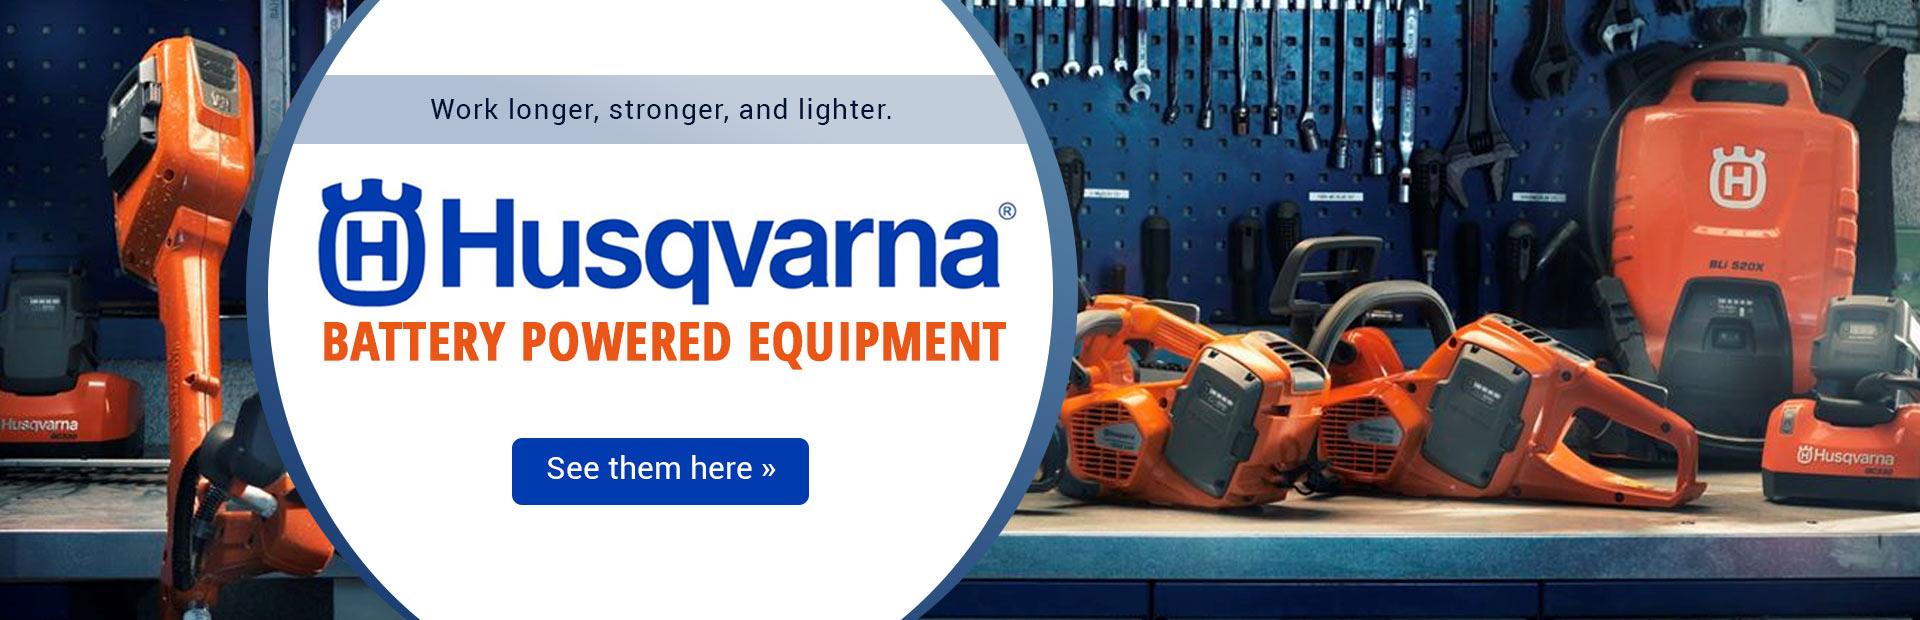 Husqvarna Battery Powered Equipment: Click here for details.